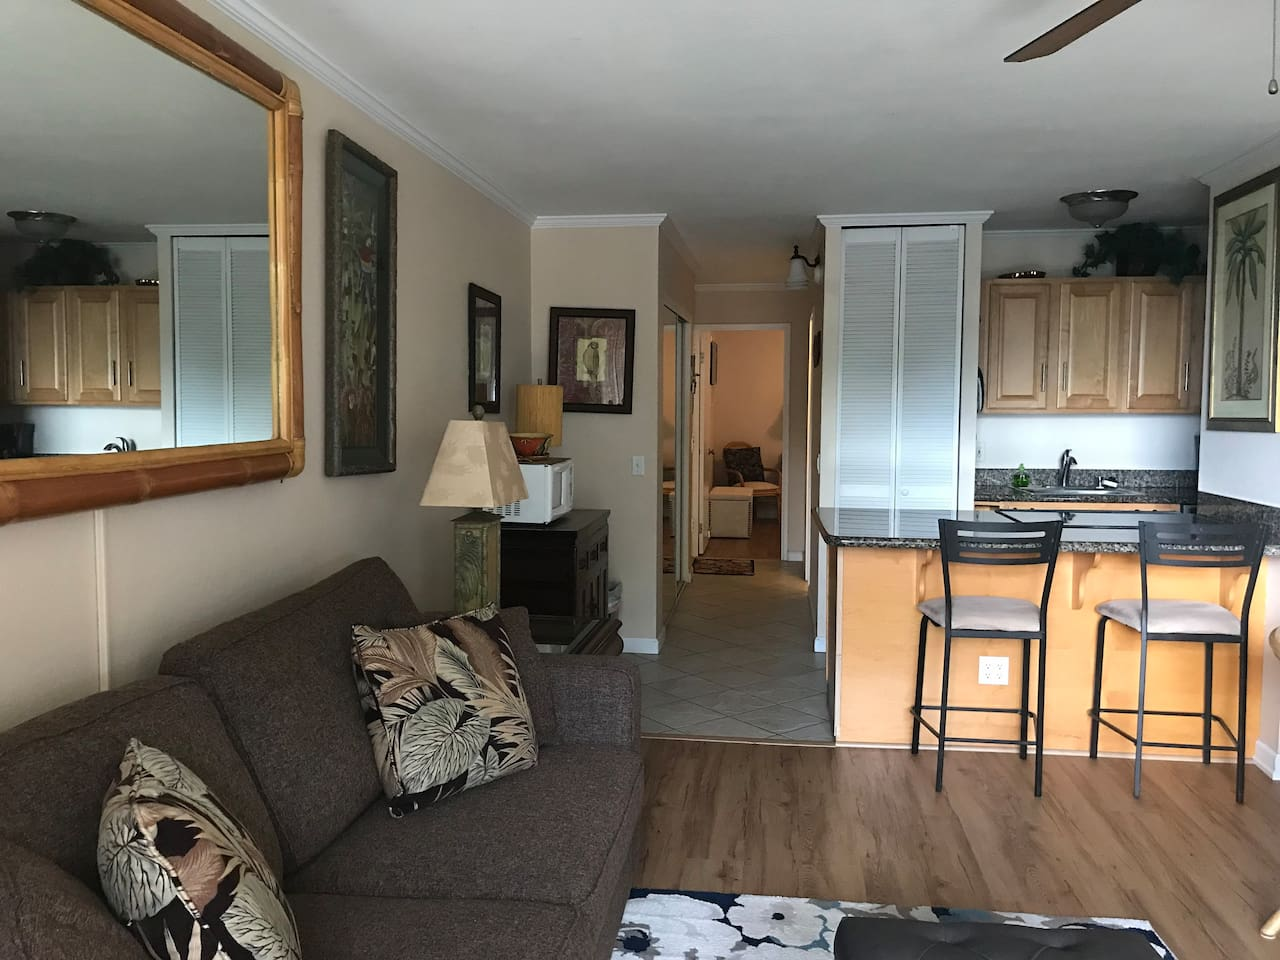 Living room Kitchen, hallway to bedroom and bath.